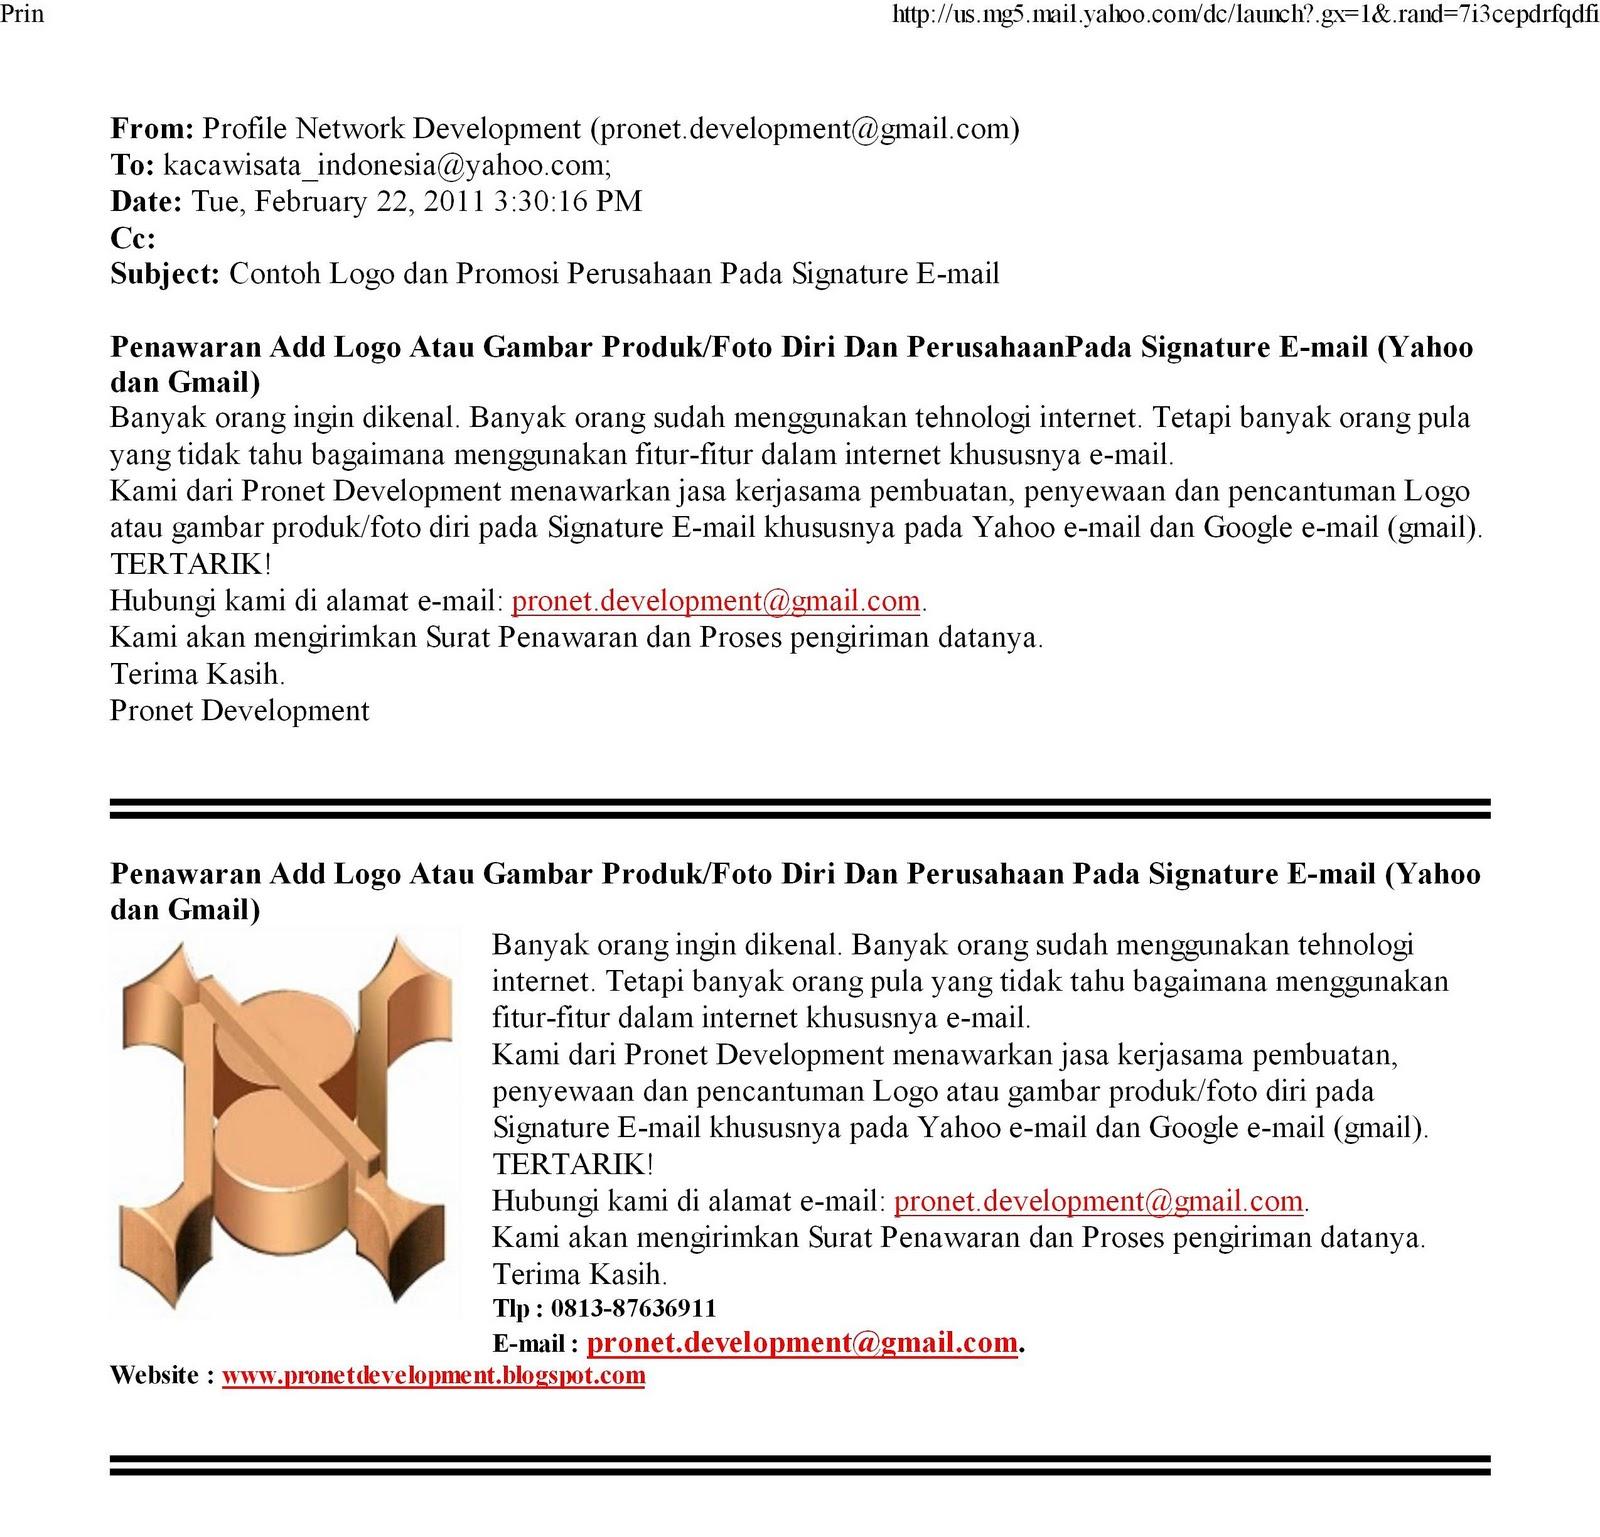 Pronet Development™: CONTOH TAMPILAN SIGNATURE PADA